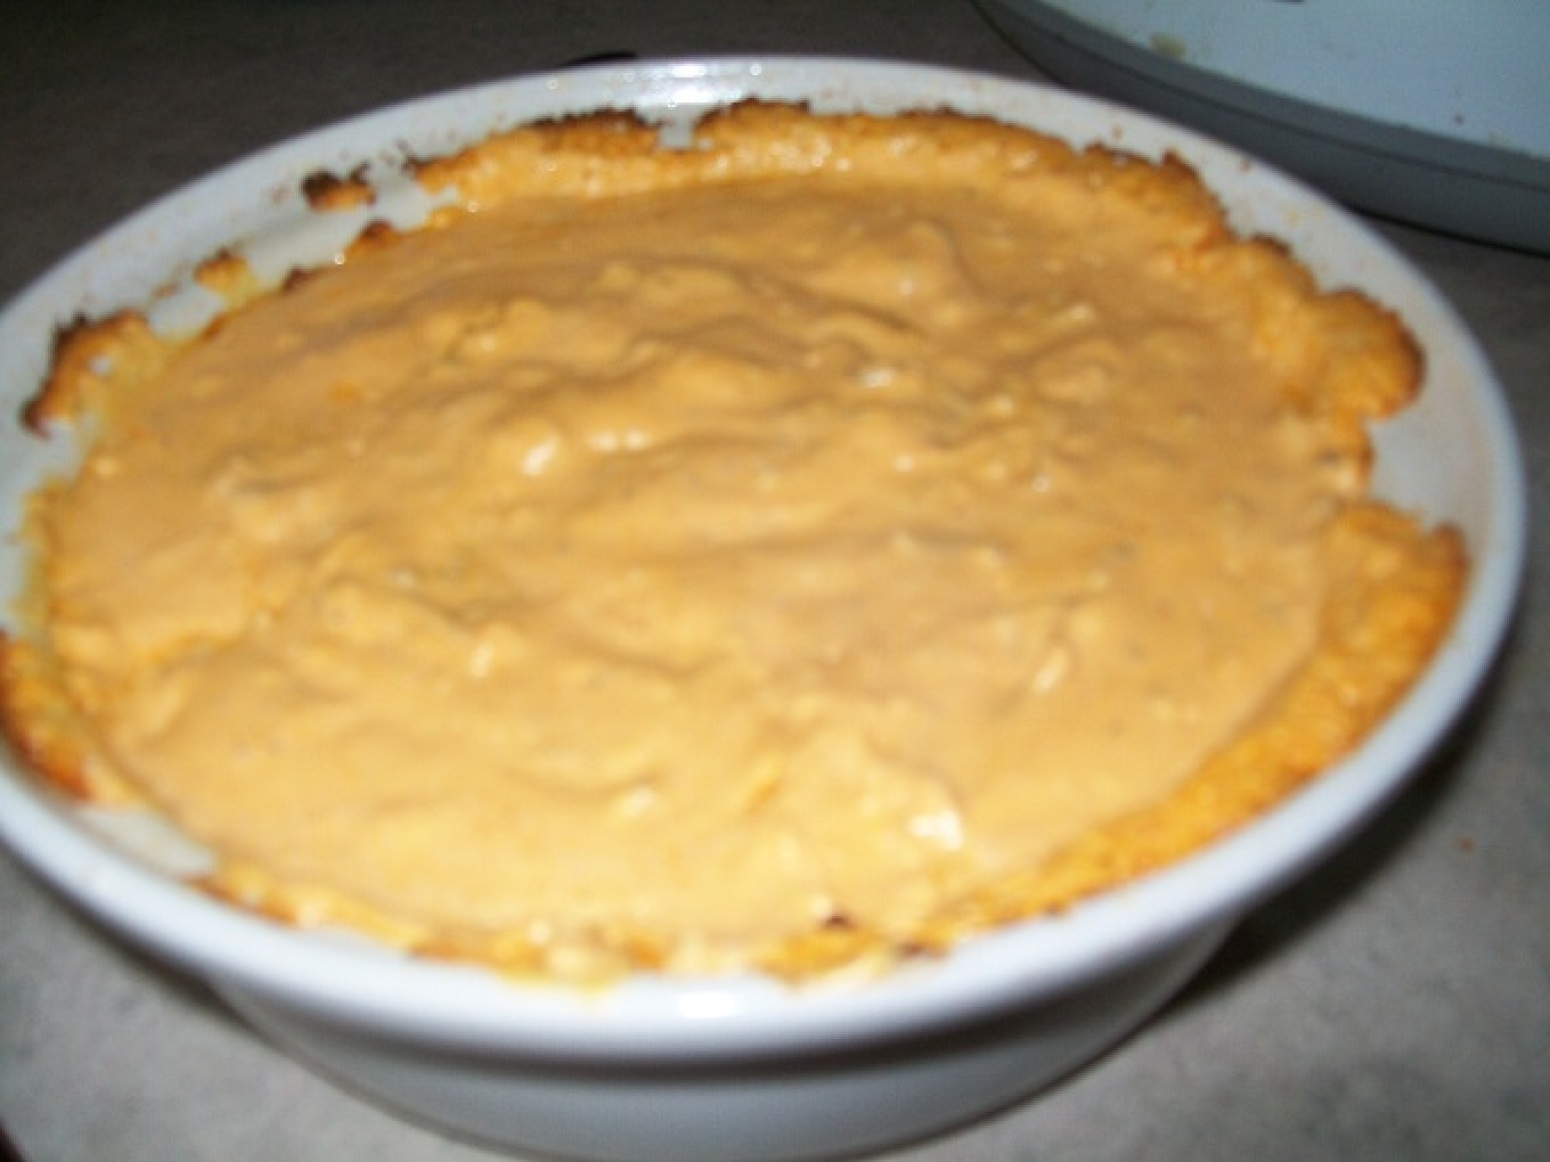 Crockpot Buffalo Chicken Dip Recipe 3 Just A Pinch Recipes